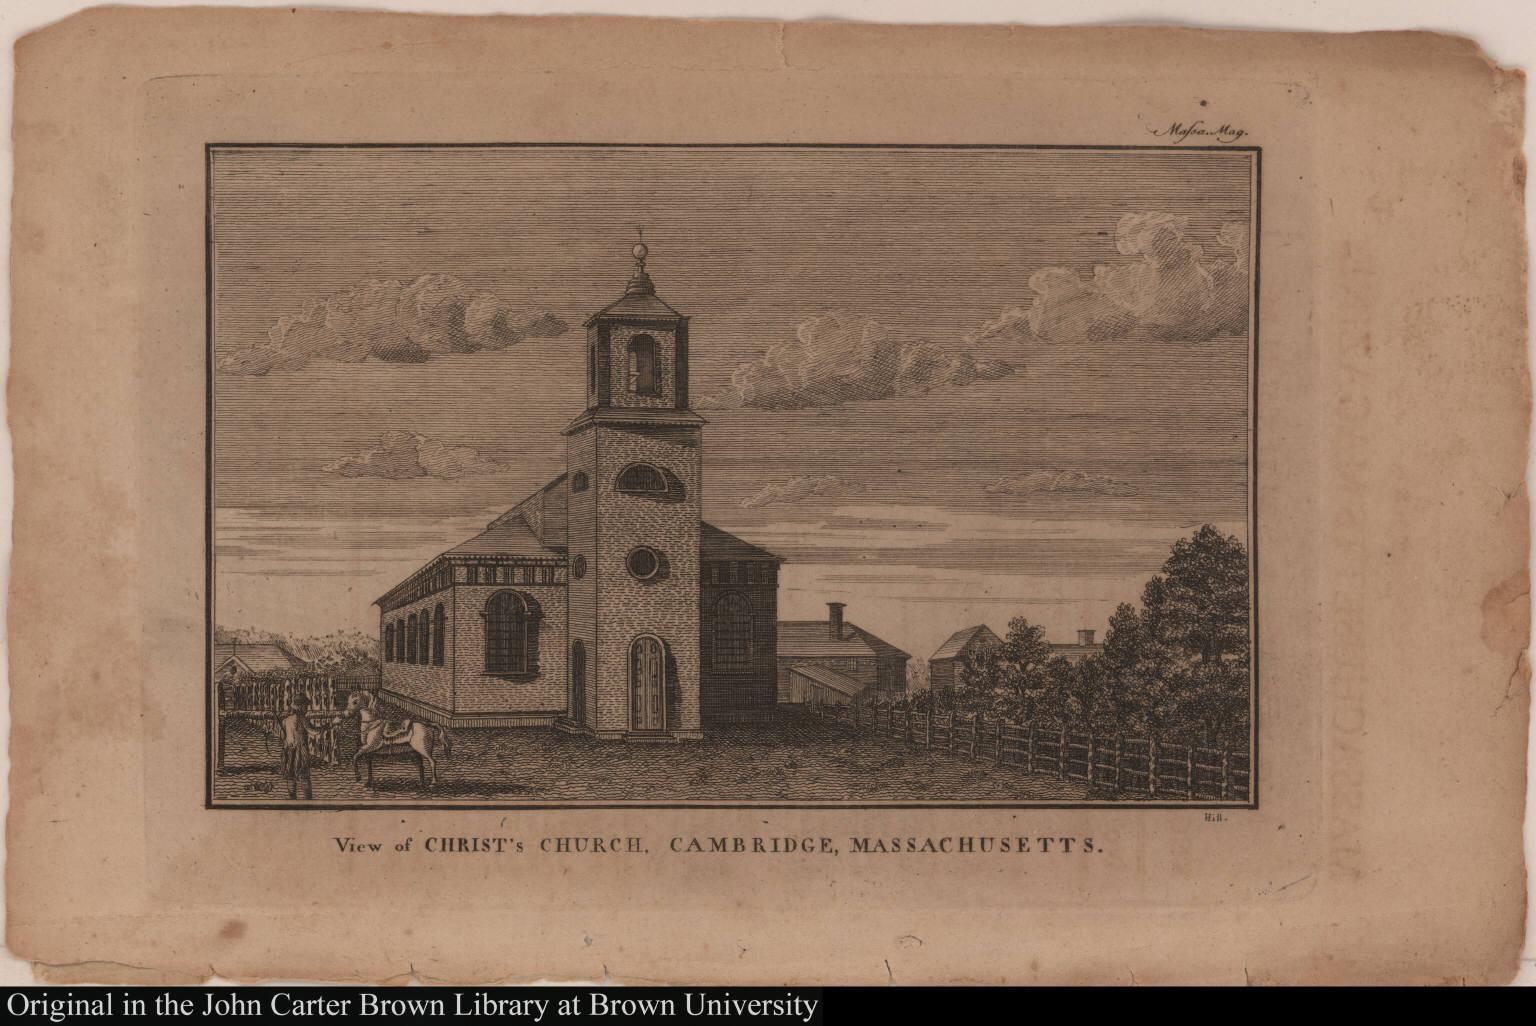 View of Christ's Church, Cambridge, Massachusetts.